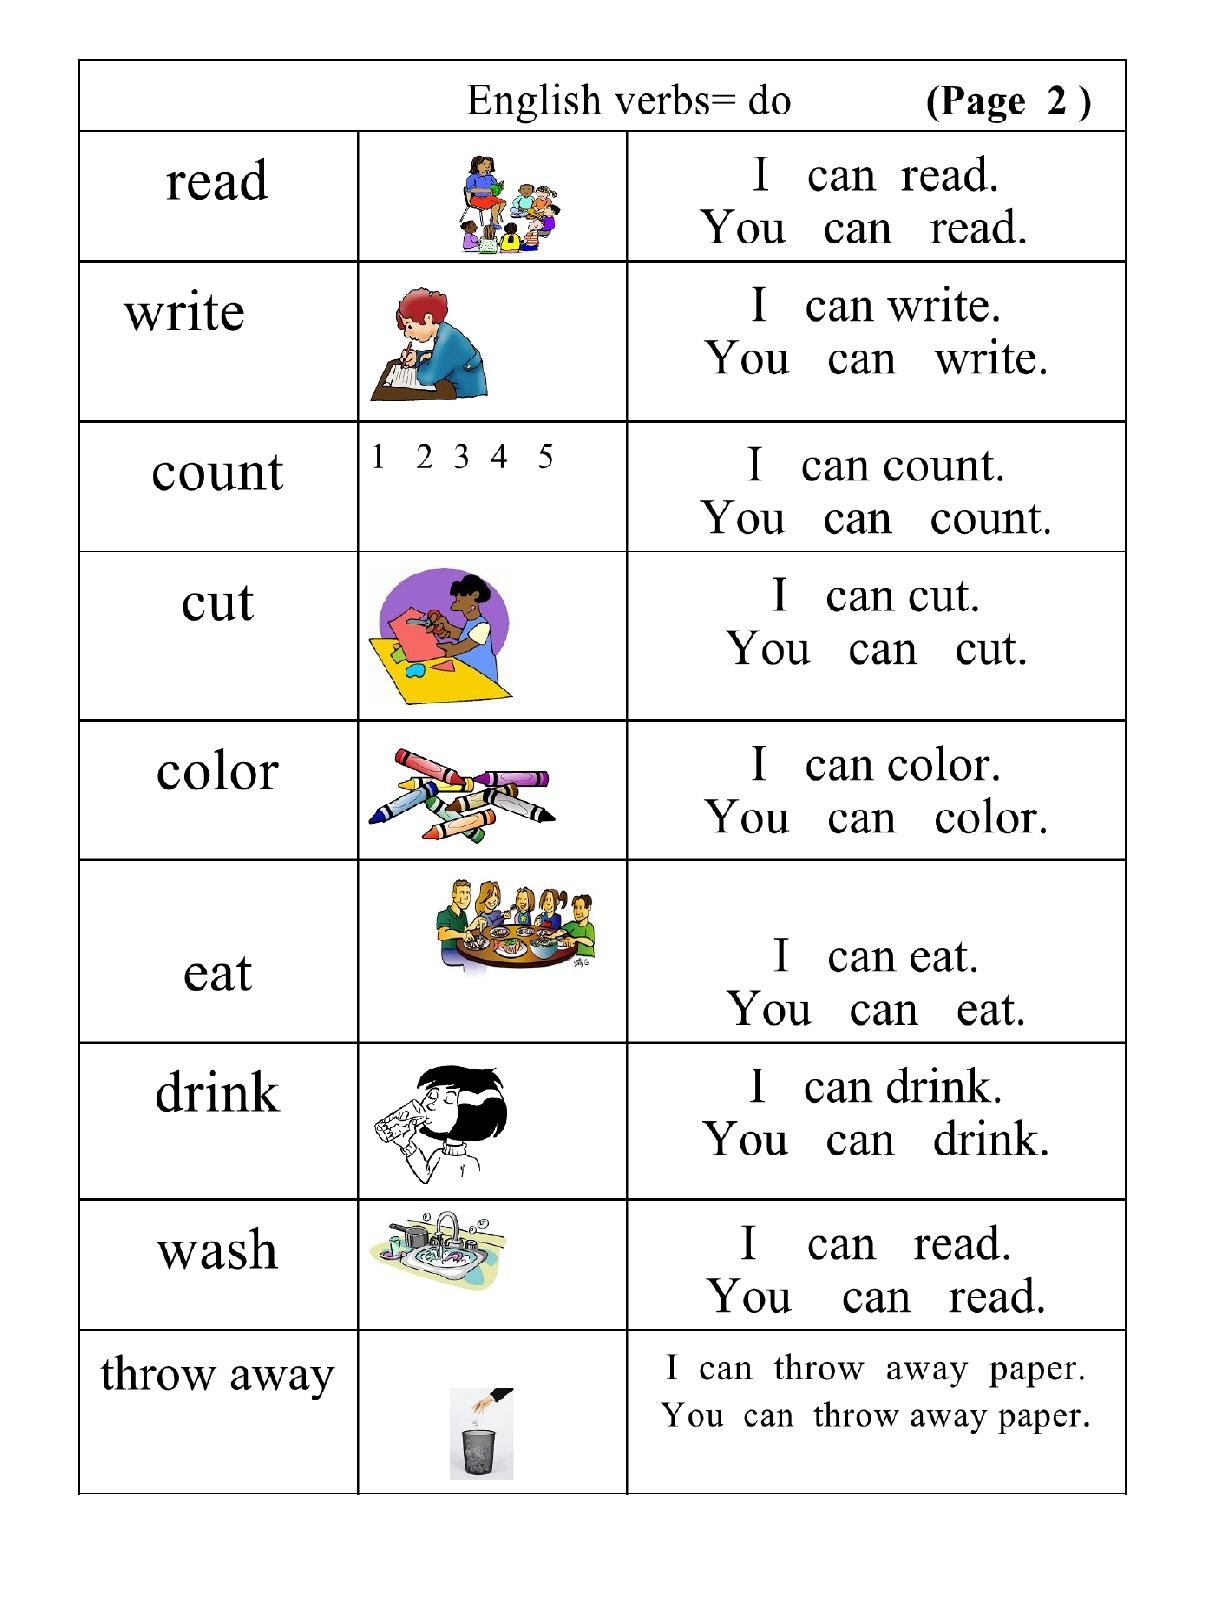 Very Basic Verbs: Group 2 | English 4 Me 2